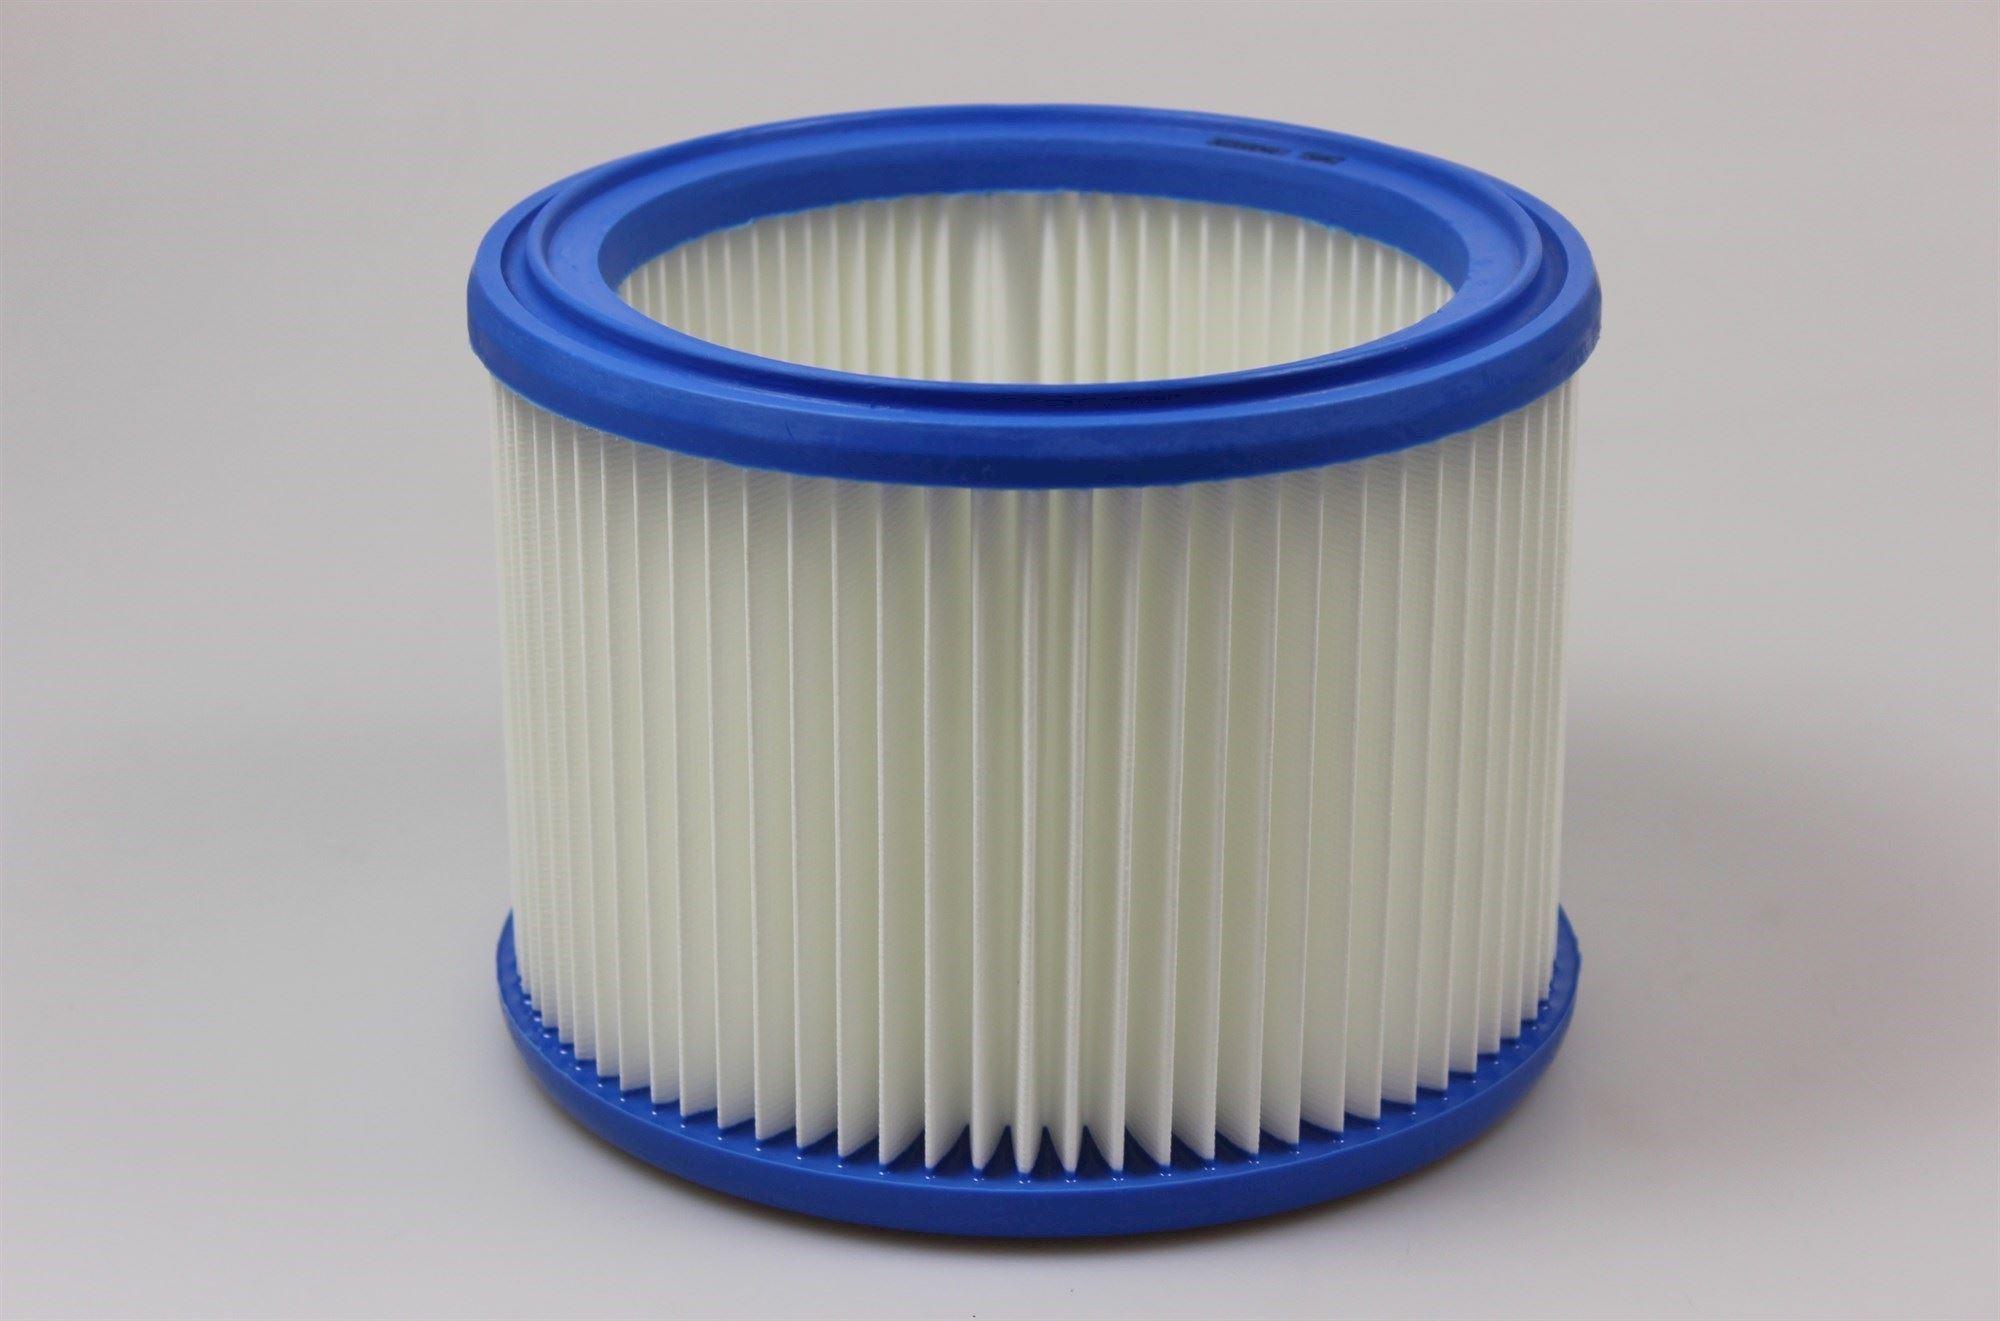 Filter til Nilfisk støvsuger | Kjøp deler her